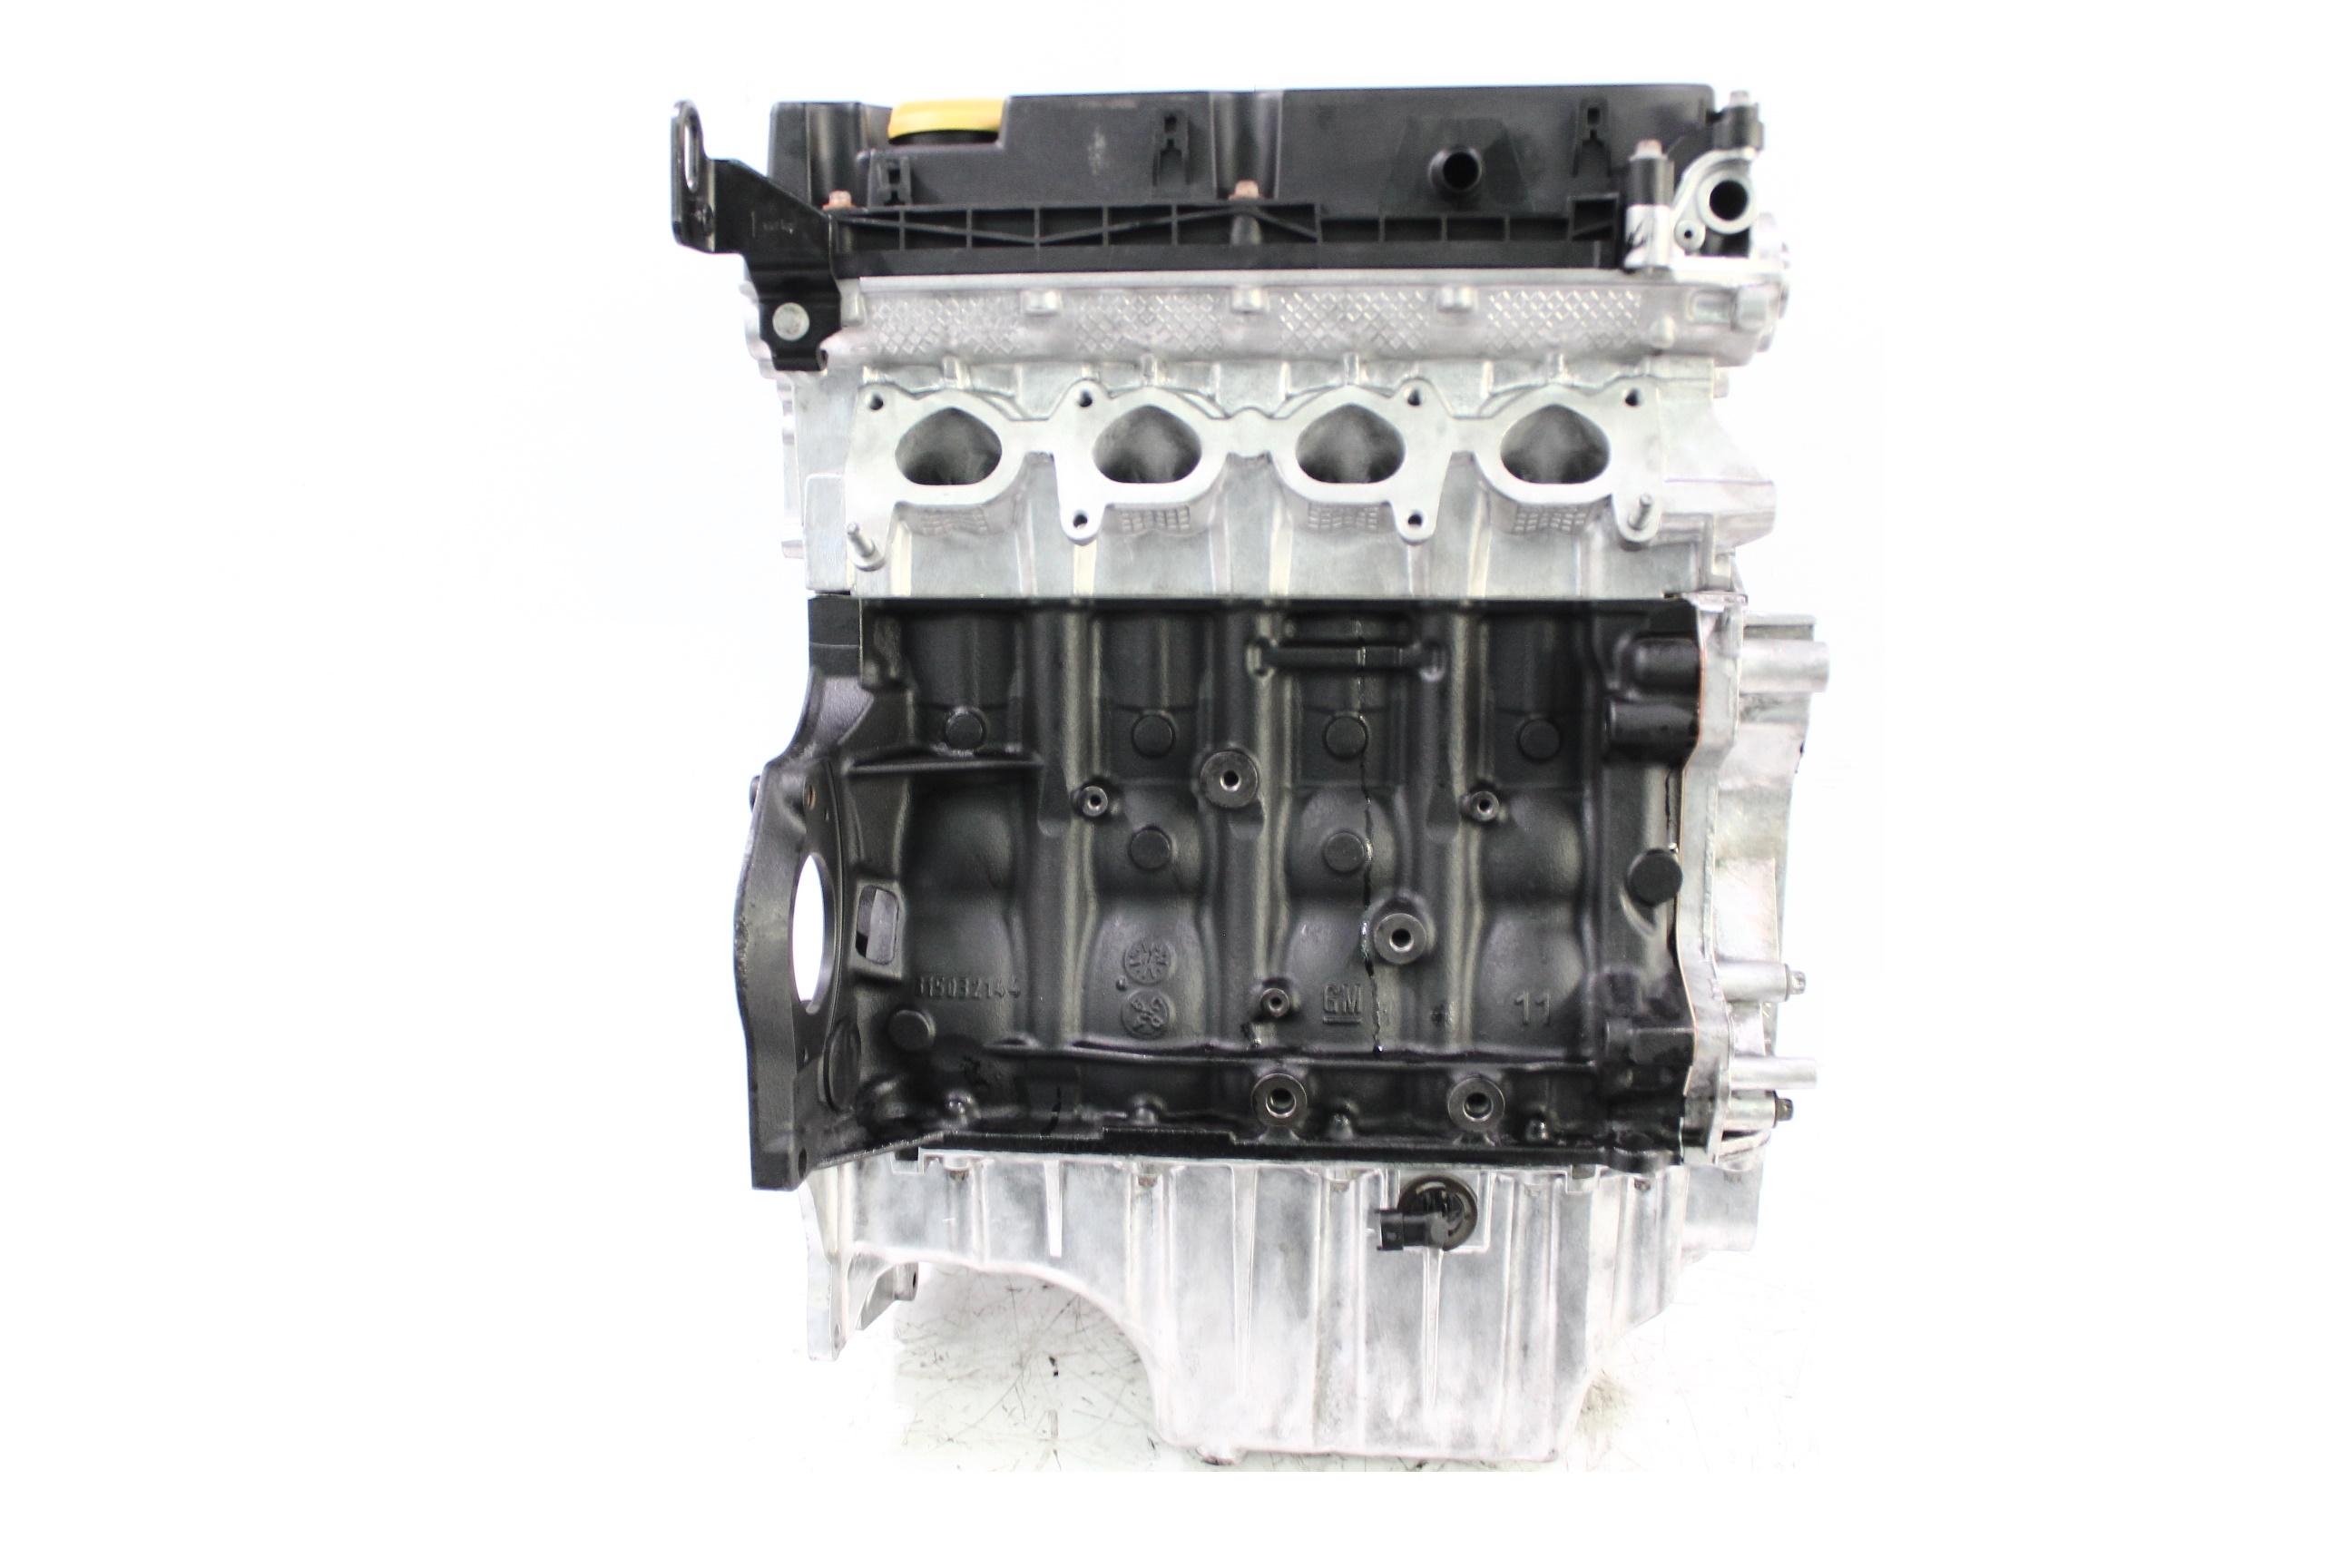 Motor 2012 Opel 1,6 Turbo A16LER Kolbenringe Dichtung NEU Kopf geplant